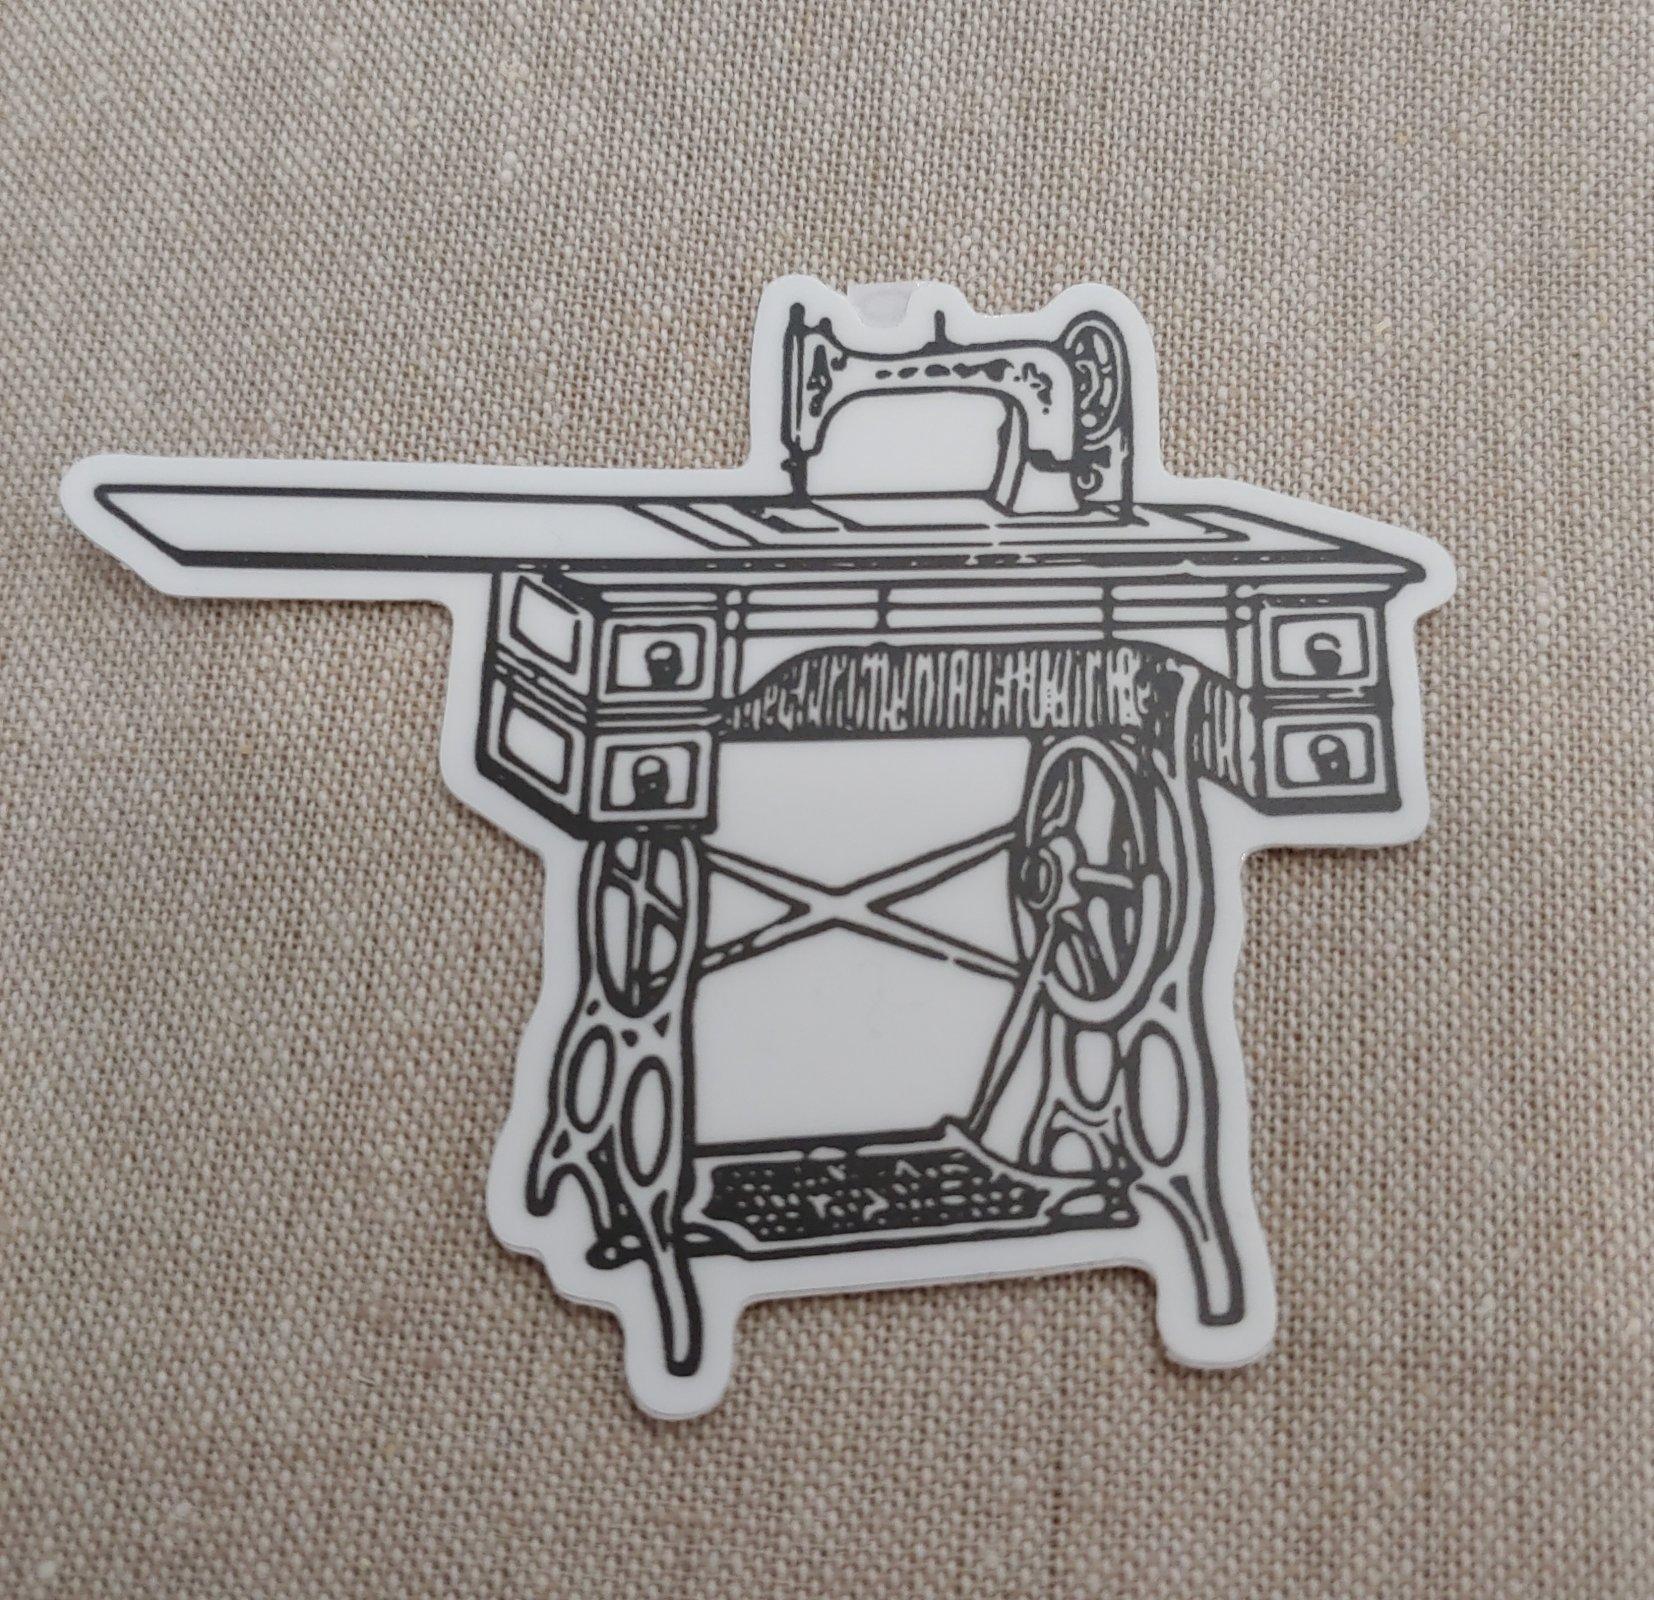 Treadle Machine sticker